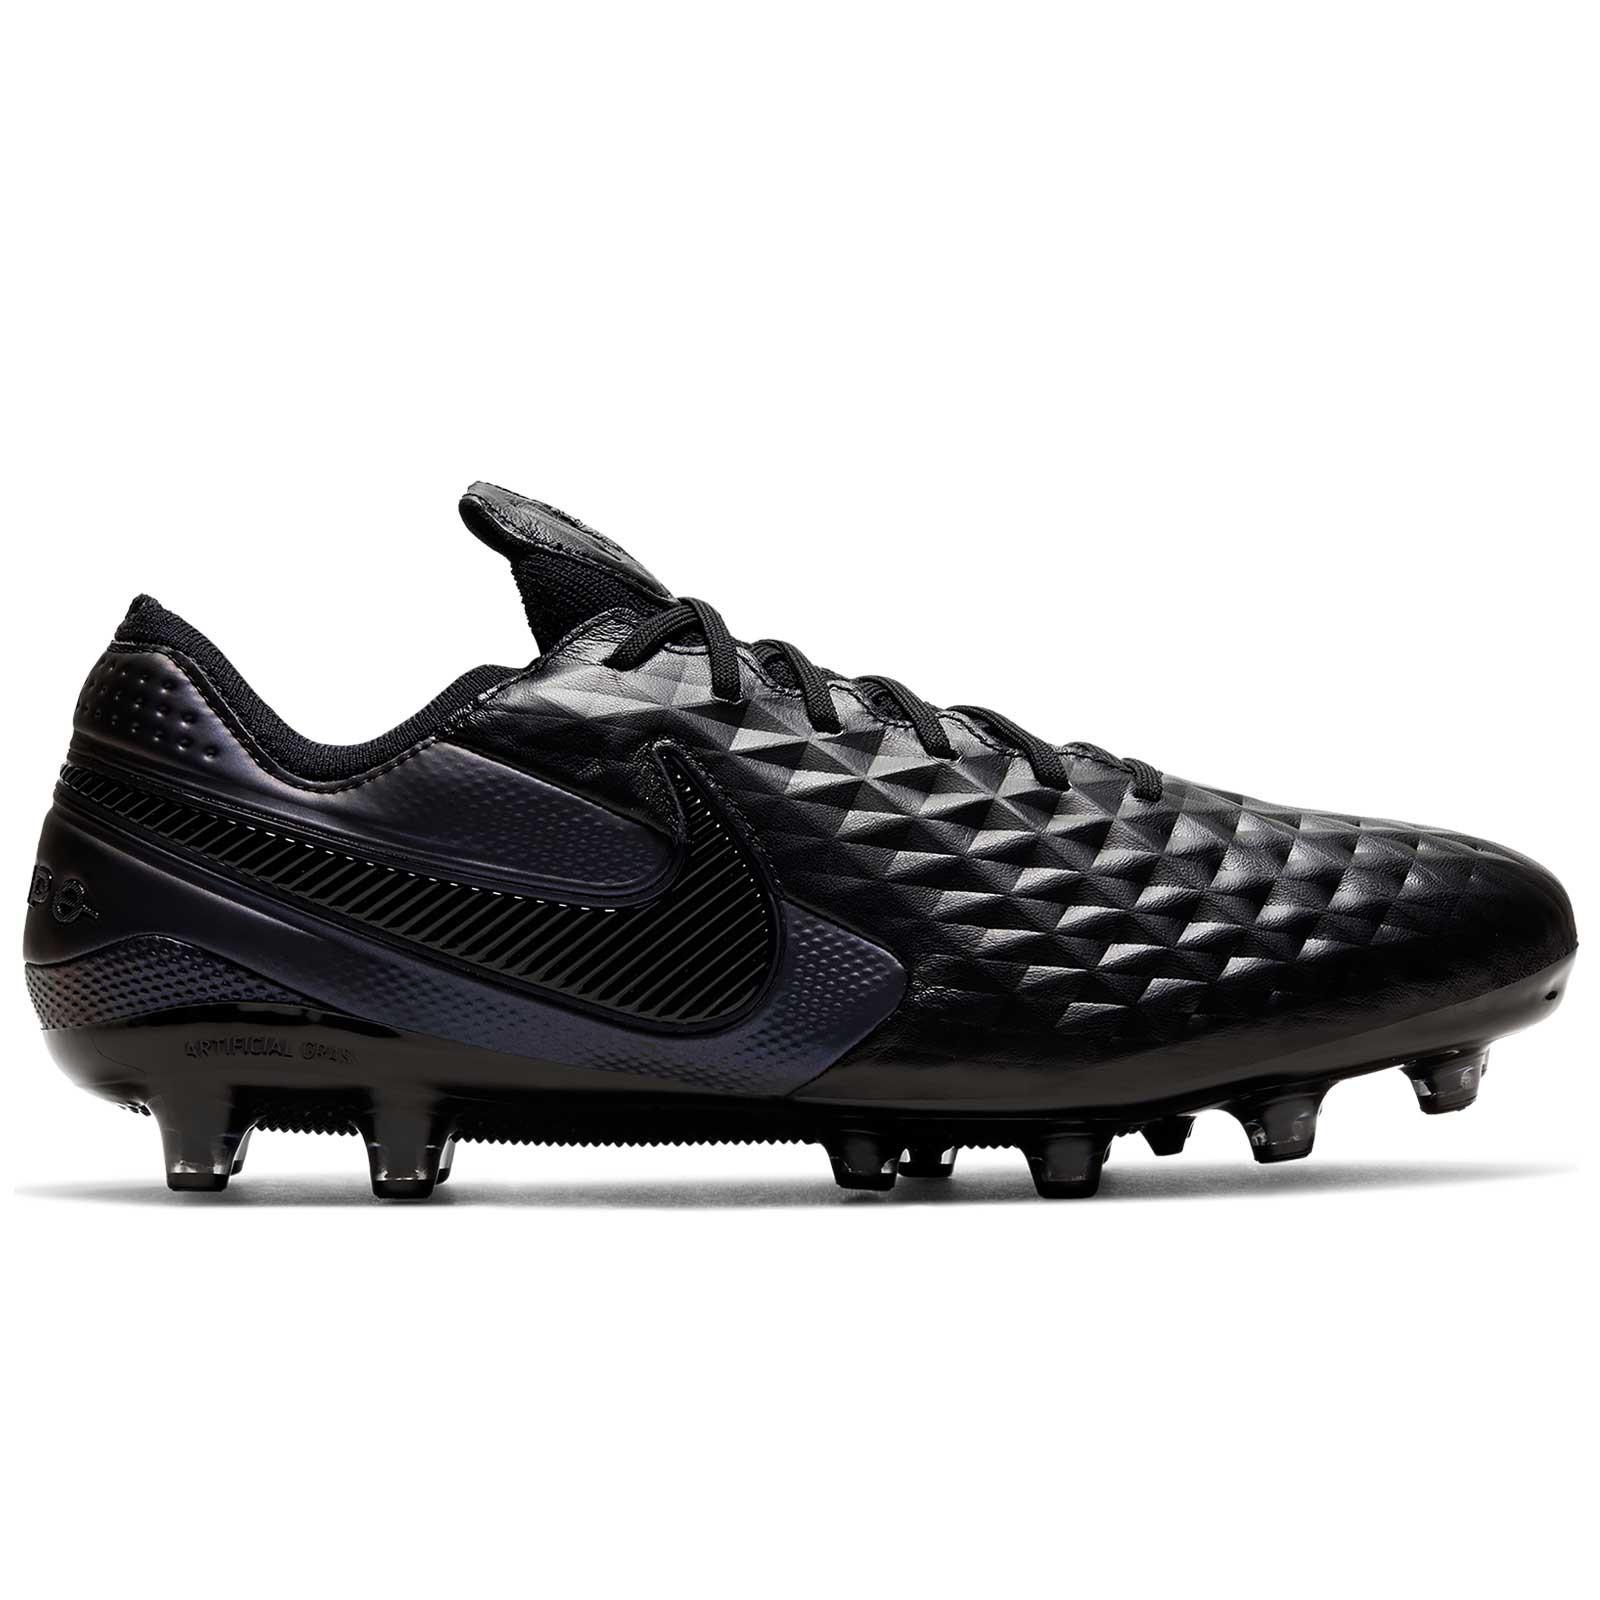 frío angustia acento  Nike Tiempo Legend 8 Elite AG-PRO negras |futbolmania